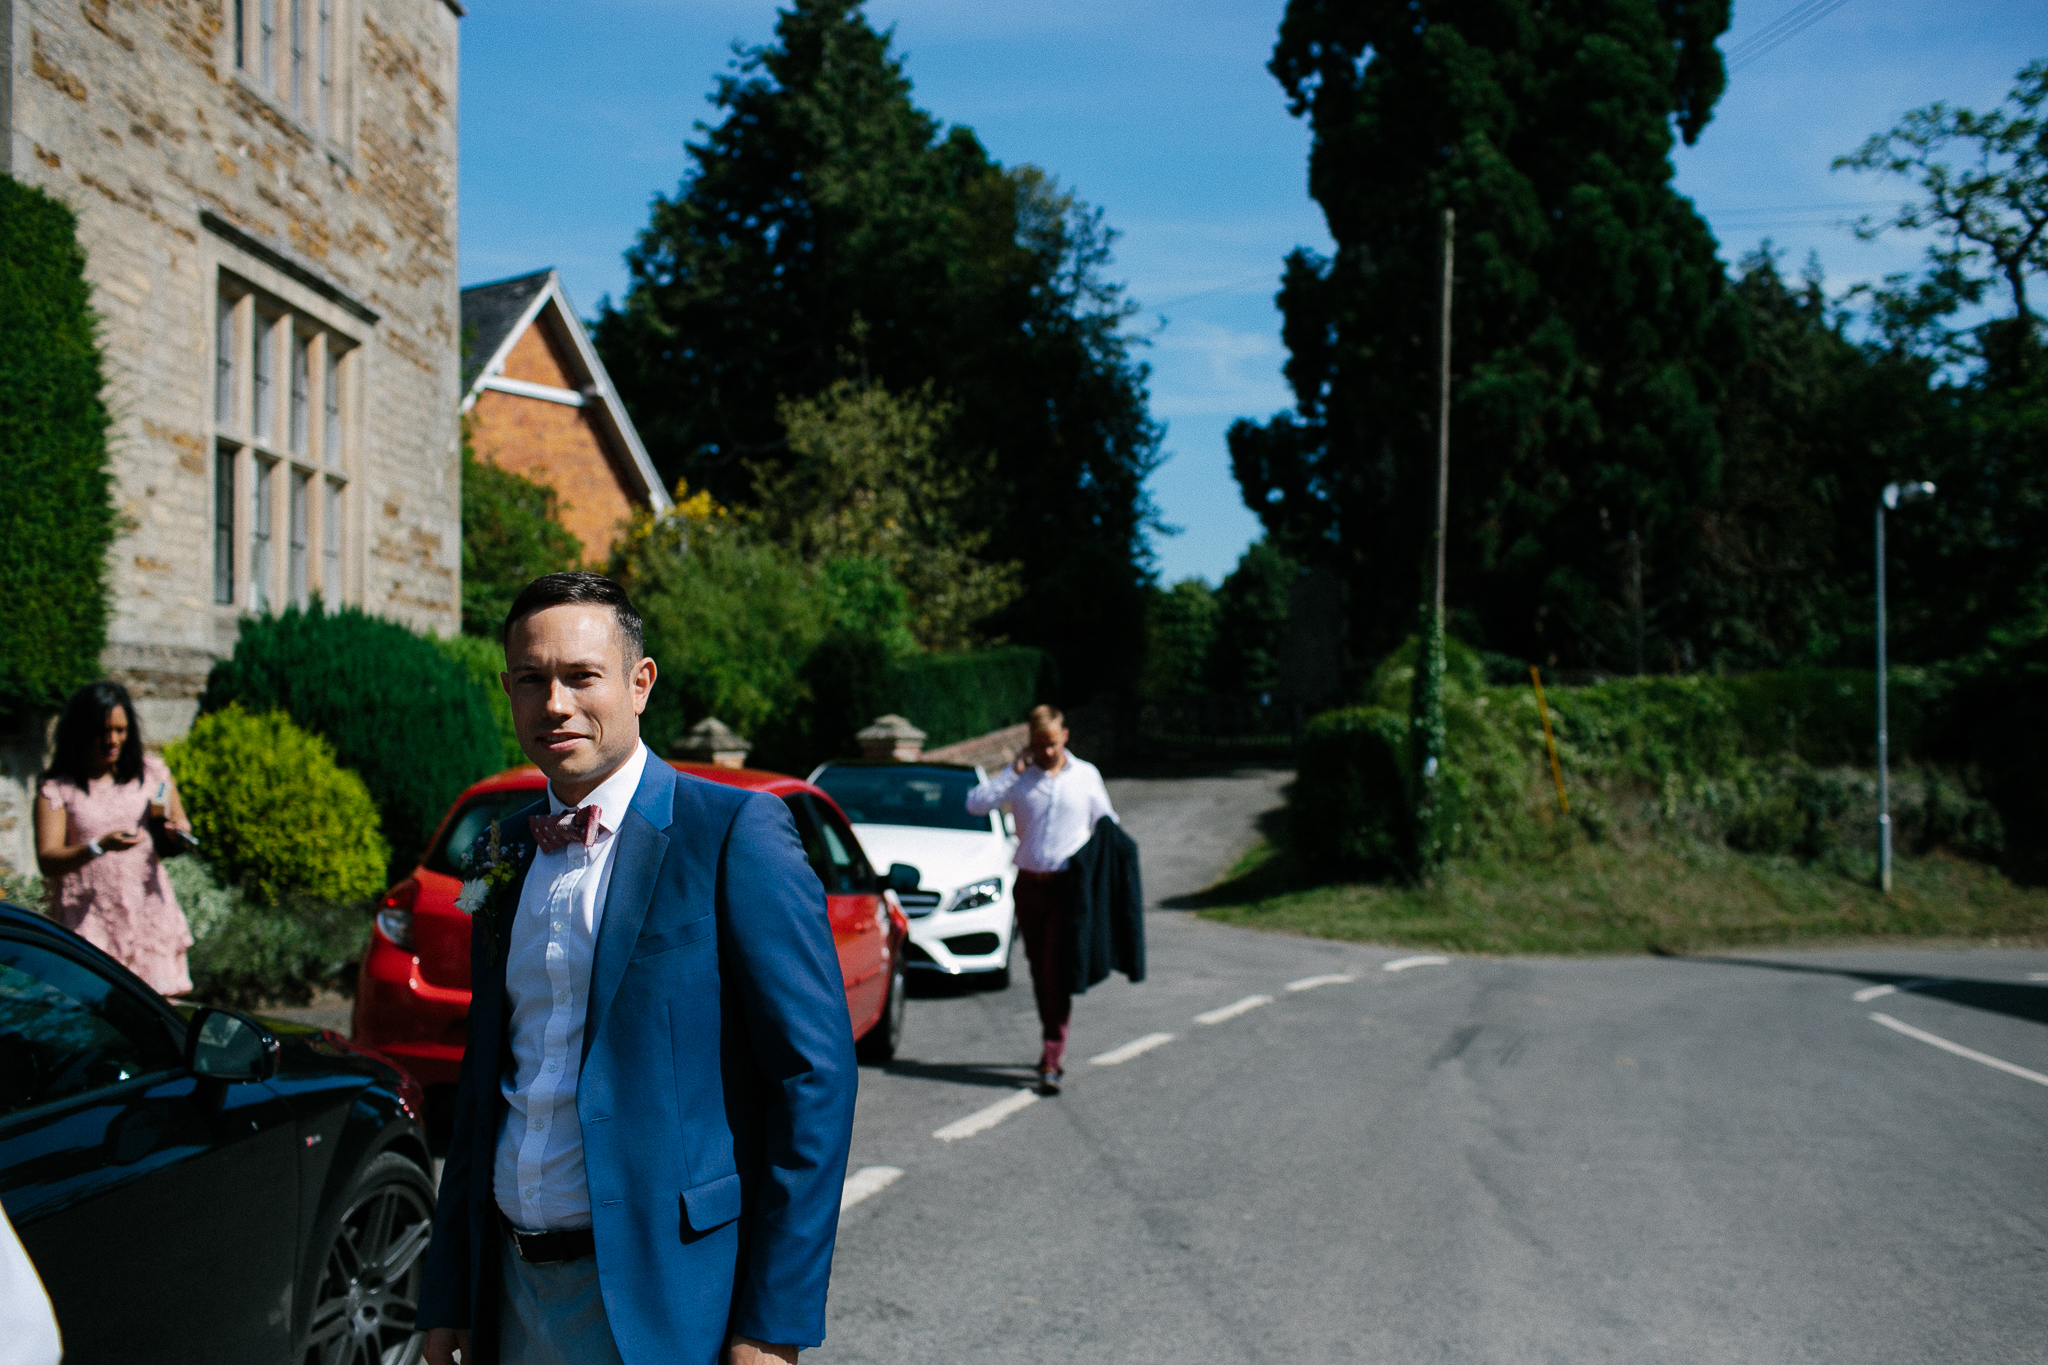 grantham_wedding_photographer-27.jpg